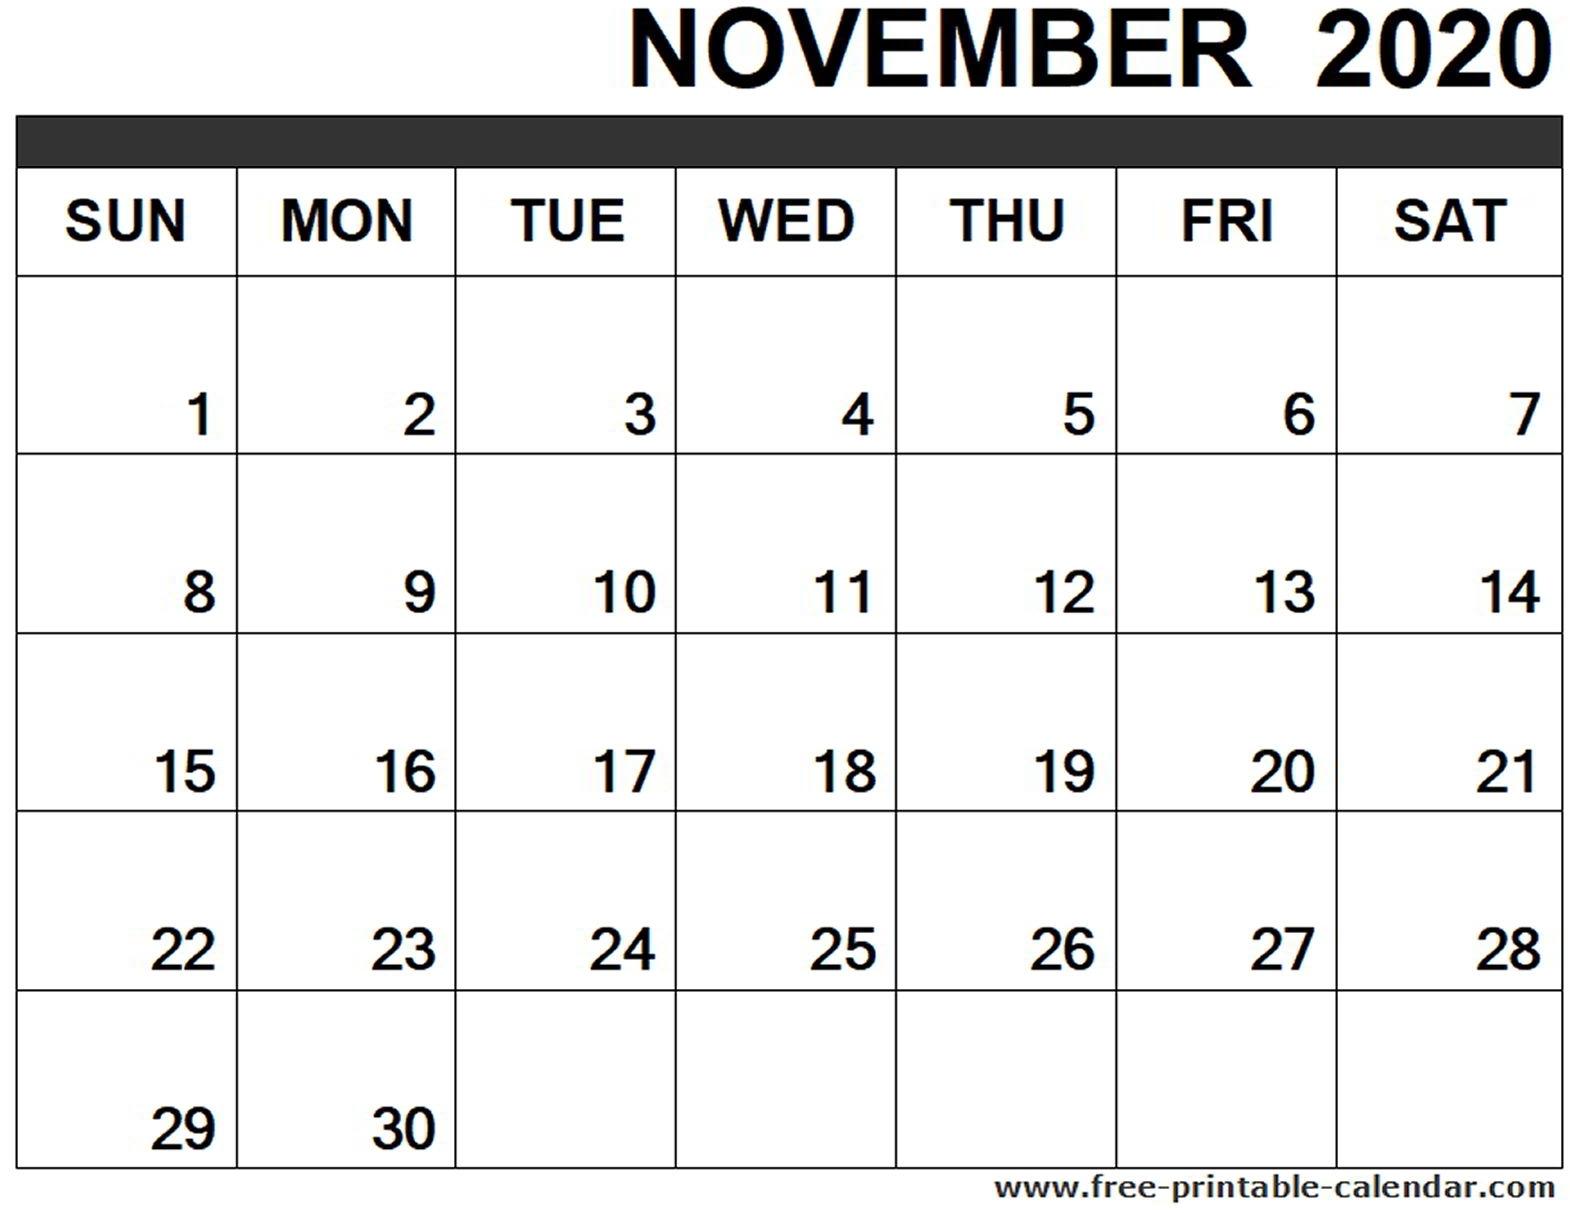 November 2020 Calendar Printable - Free-Printable-Calendar